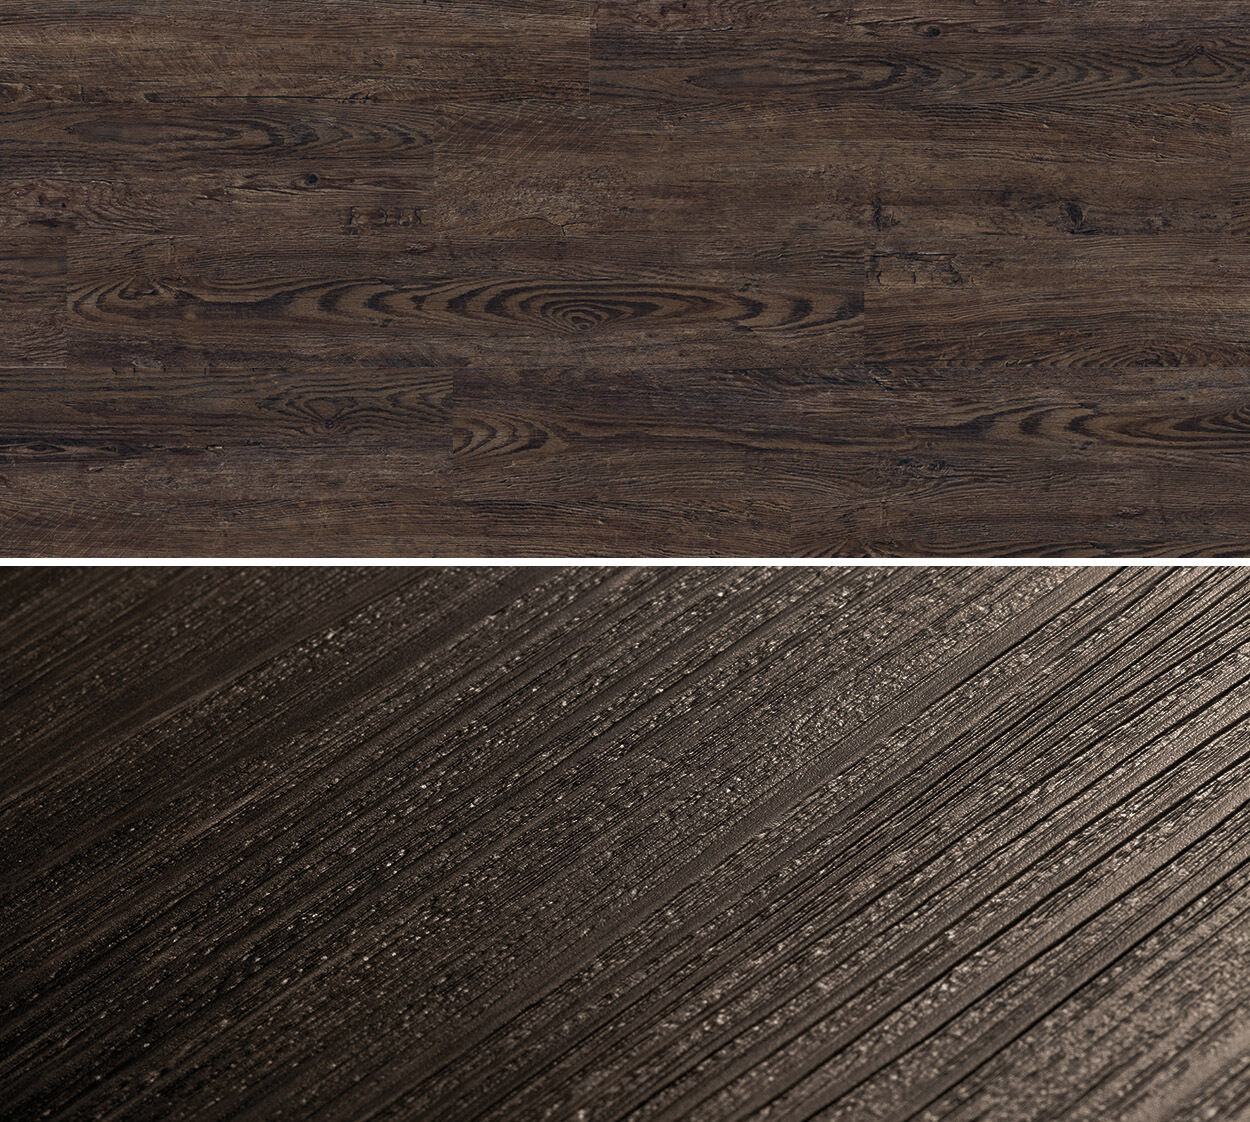 Pro m² Project Floors floors@work 80 Vinylboden Designboden Objektbereich